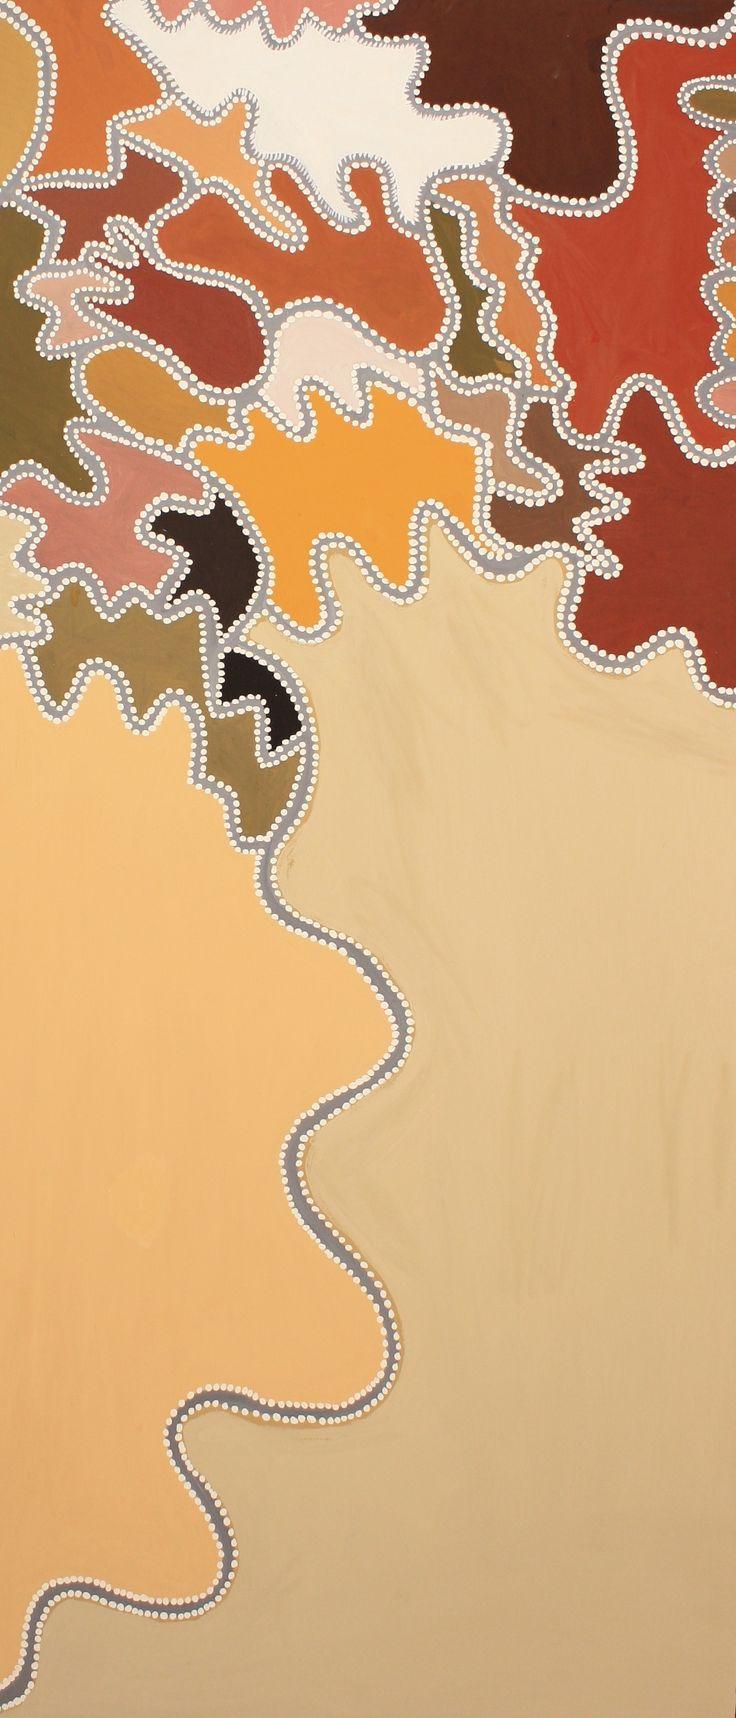 Phyllis Ningaramara - 'Woorrewoorrem - Wet Season', 2013 - 180 x 80cm - Natural ochre and pigments on canvas - Ref. 439013 - IDAIA - International Development of Australian Indigenous Art © The Artists - Photos Courtesy of Waringarri Aboriginal Arts